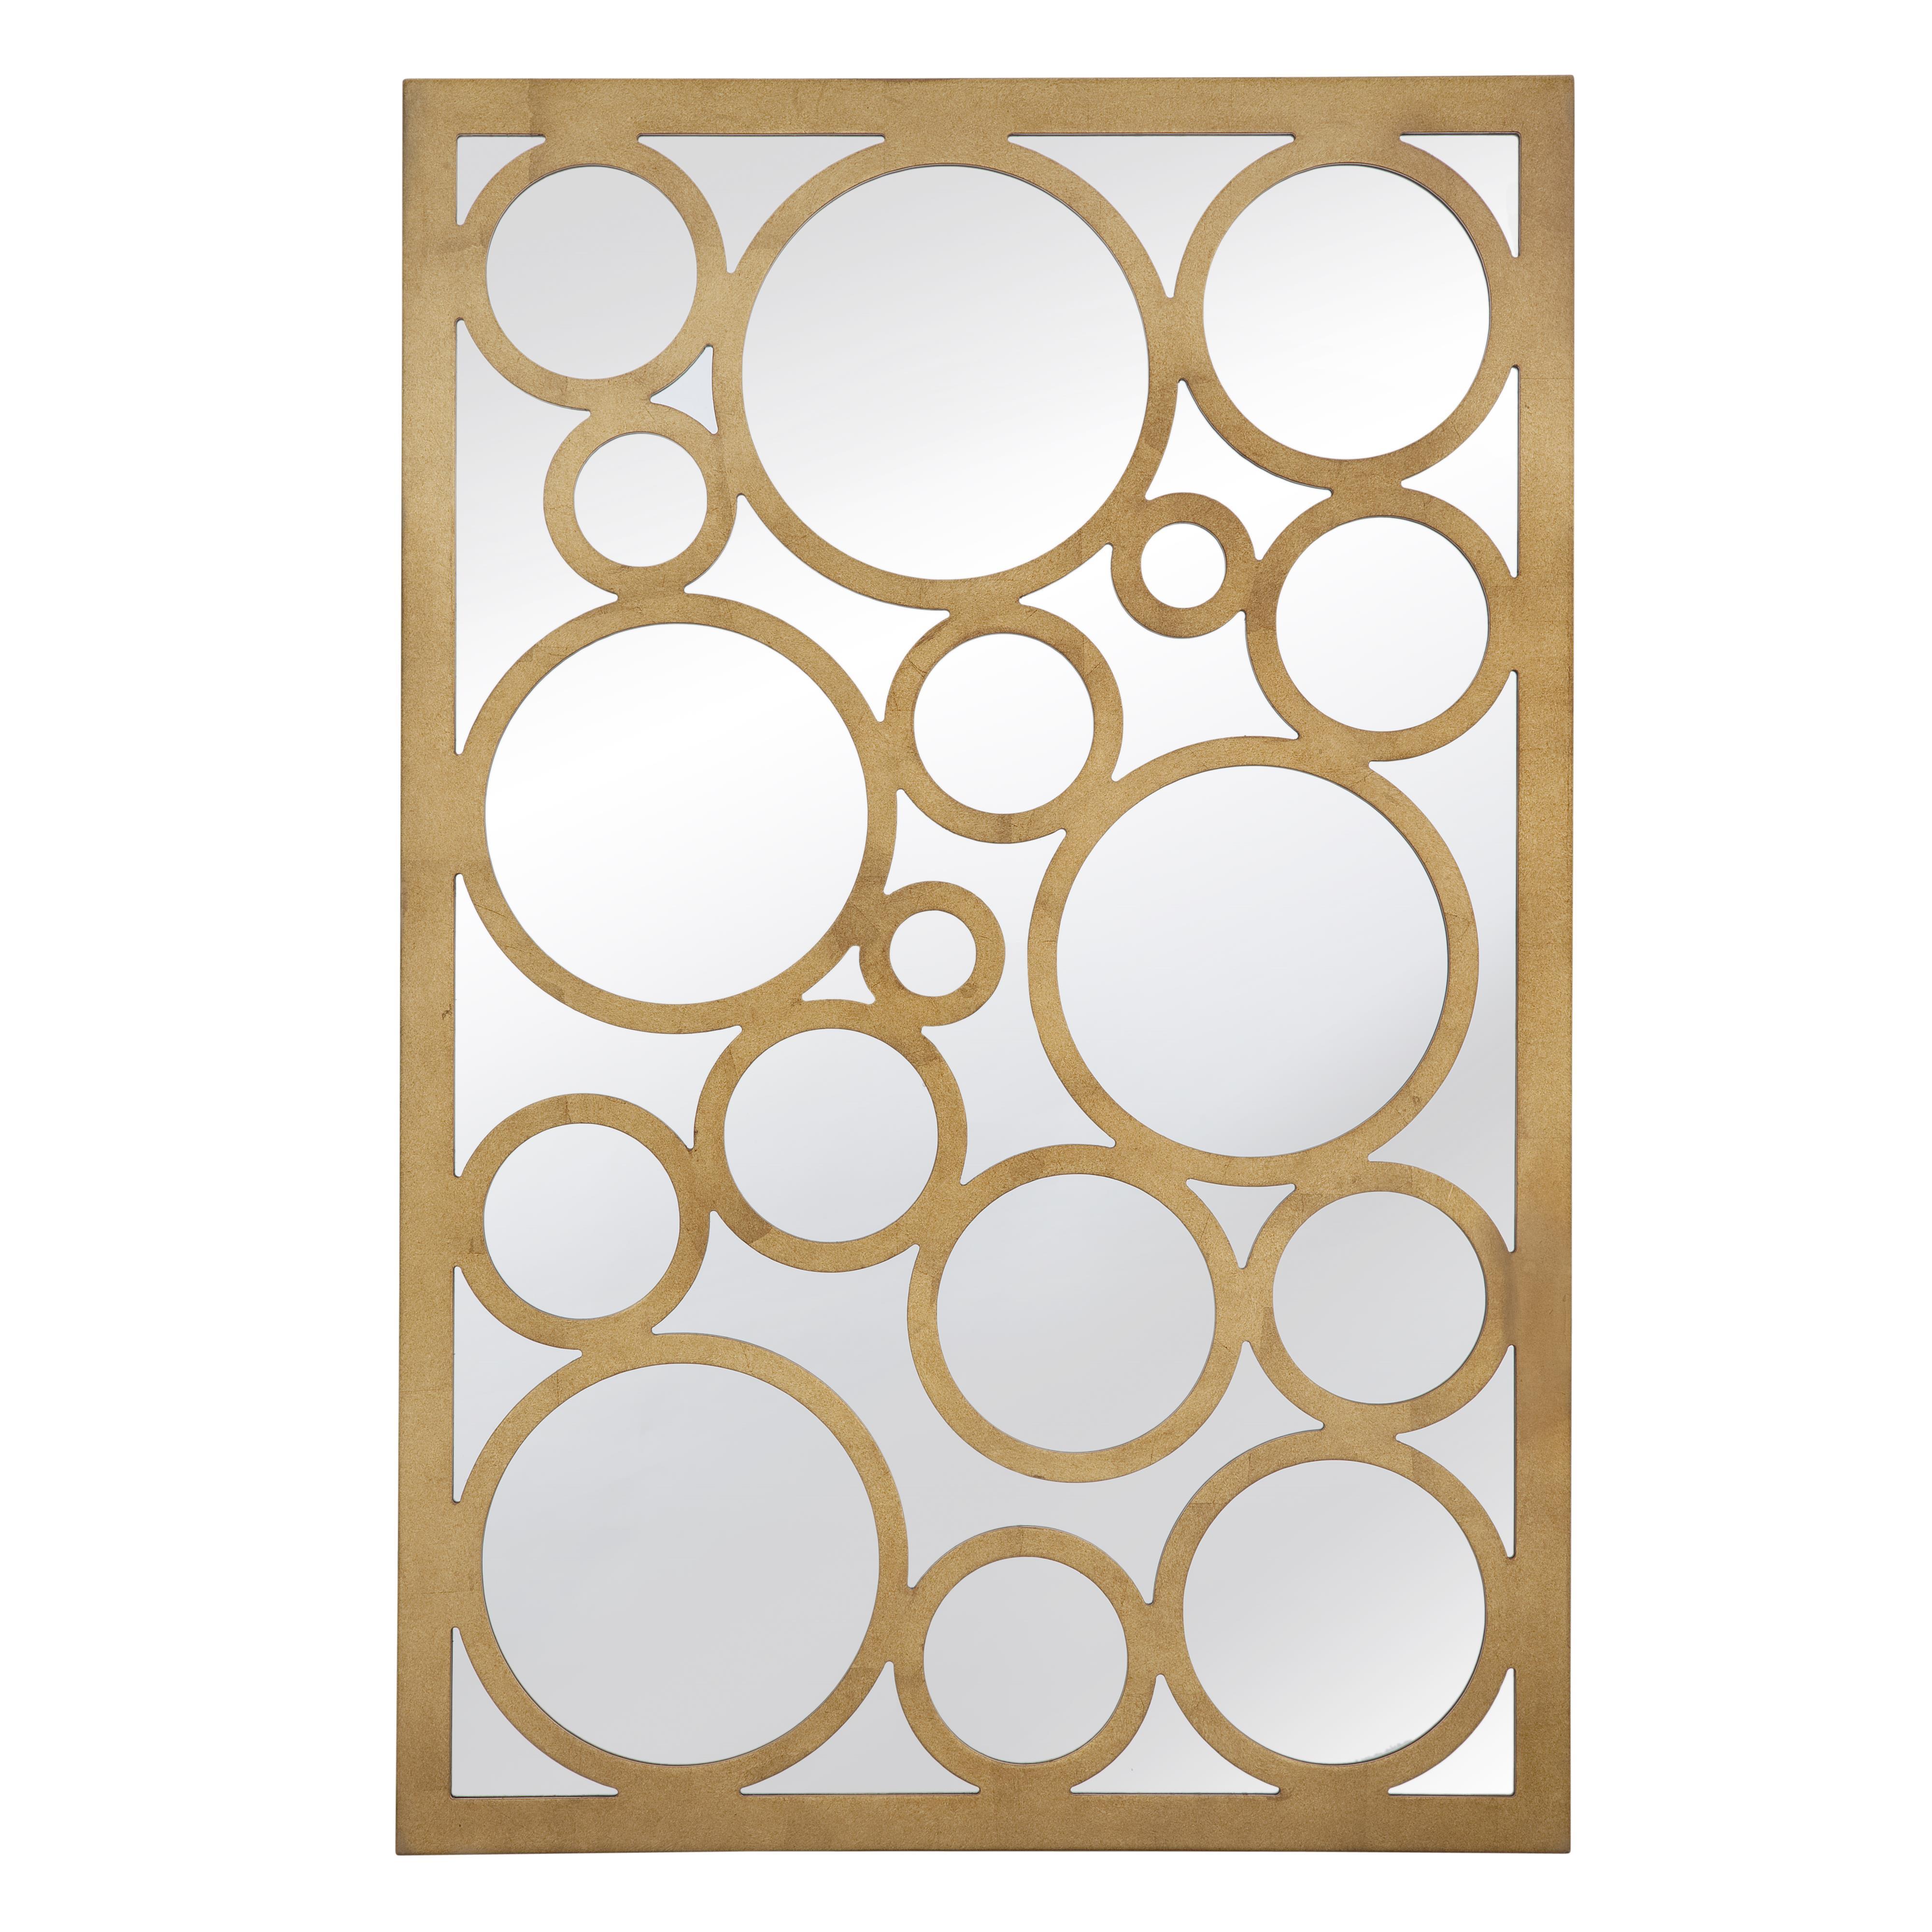 Thoroughly Modern Brandon Wall Mirror by Bassett Mirror at Alison Craig Home Furnishings